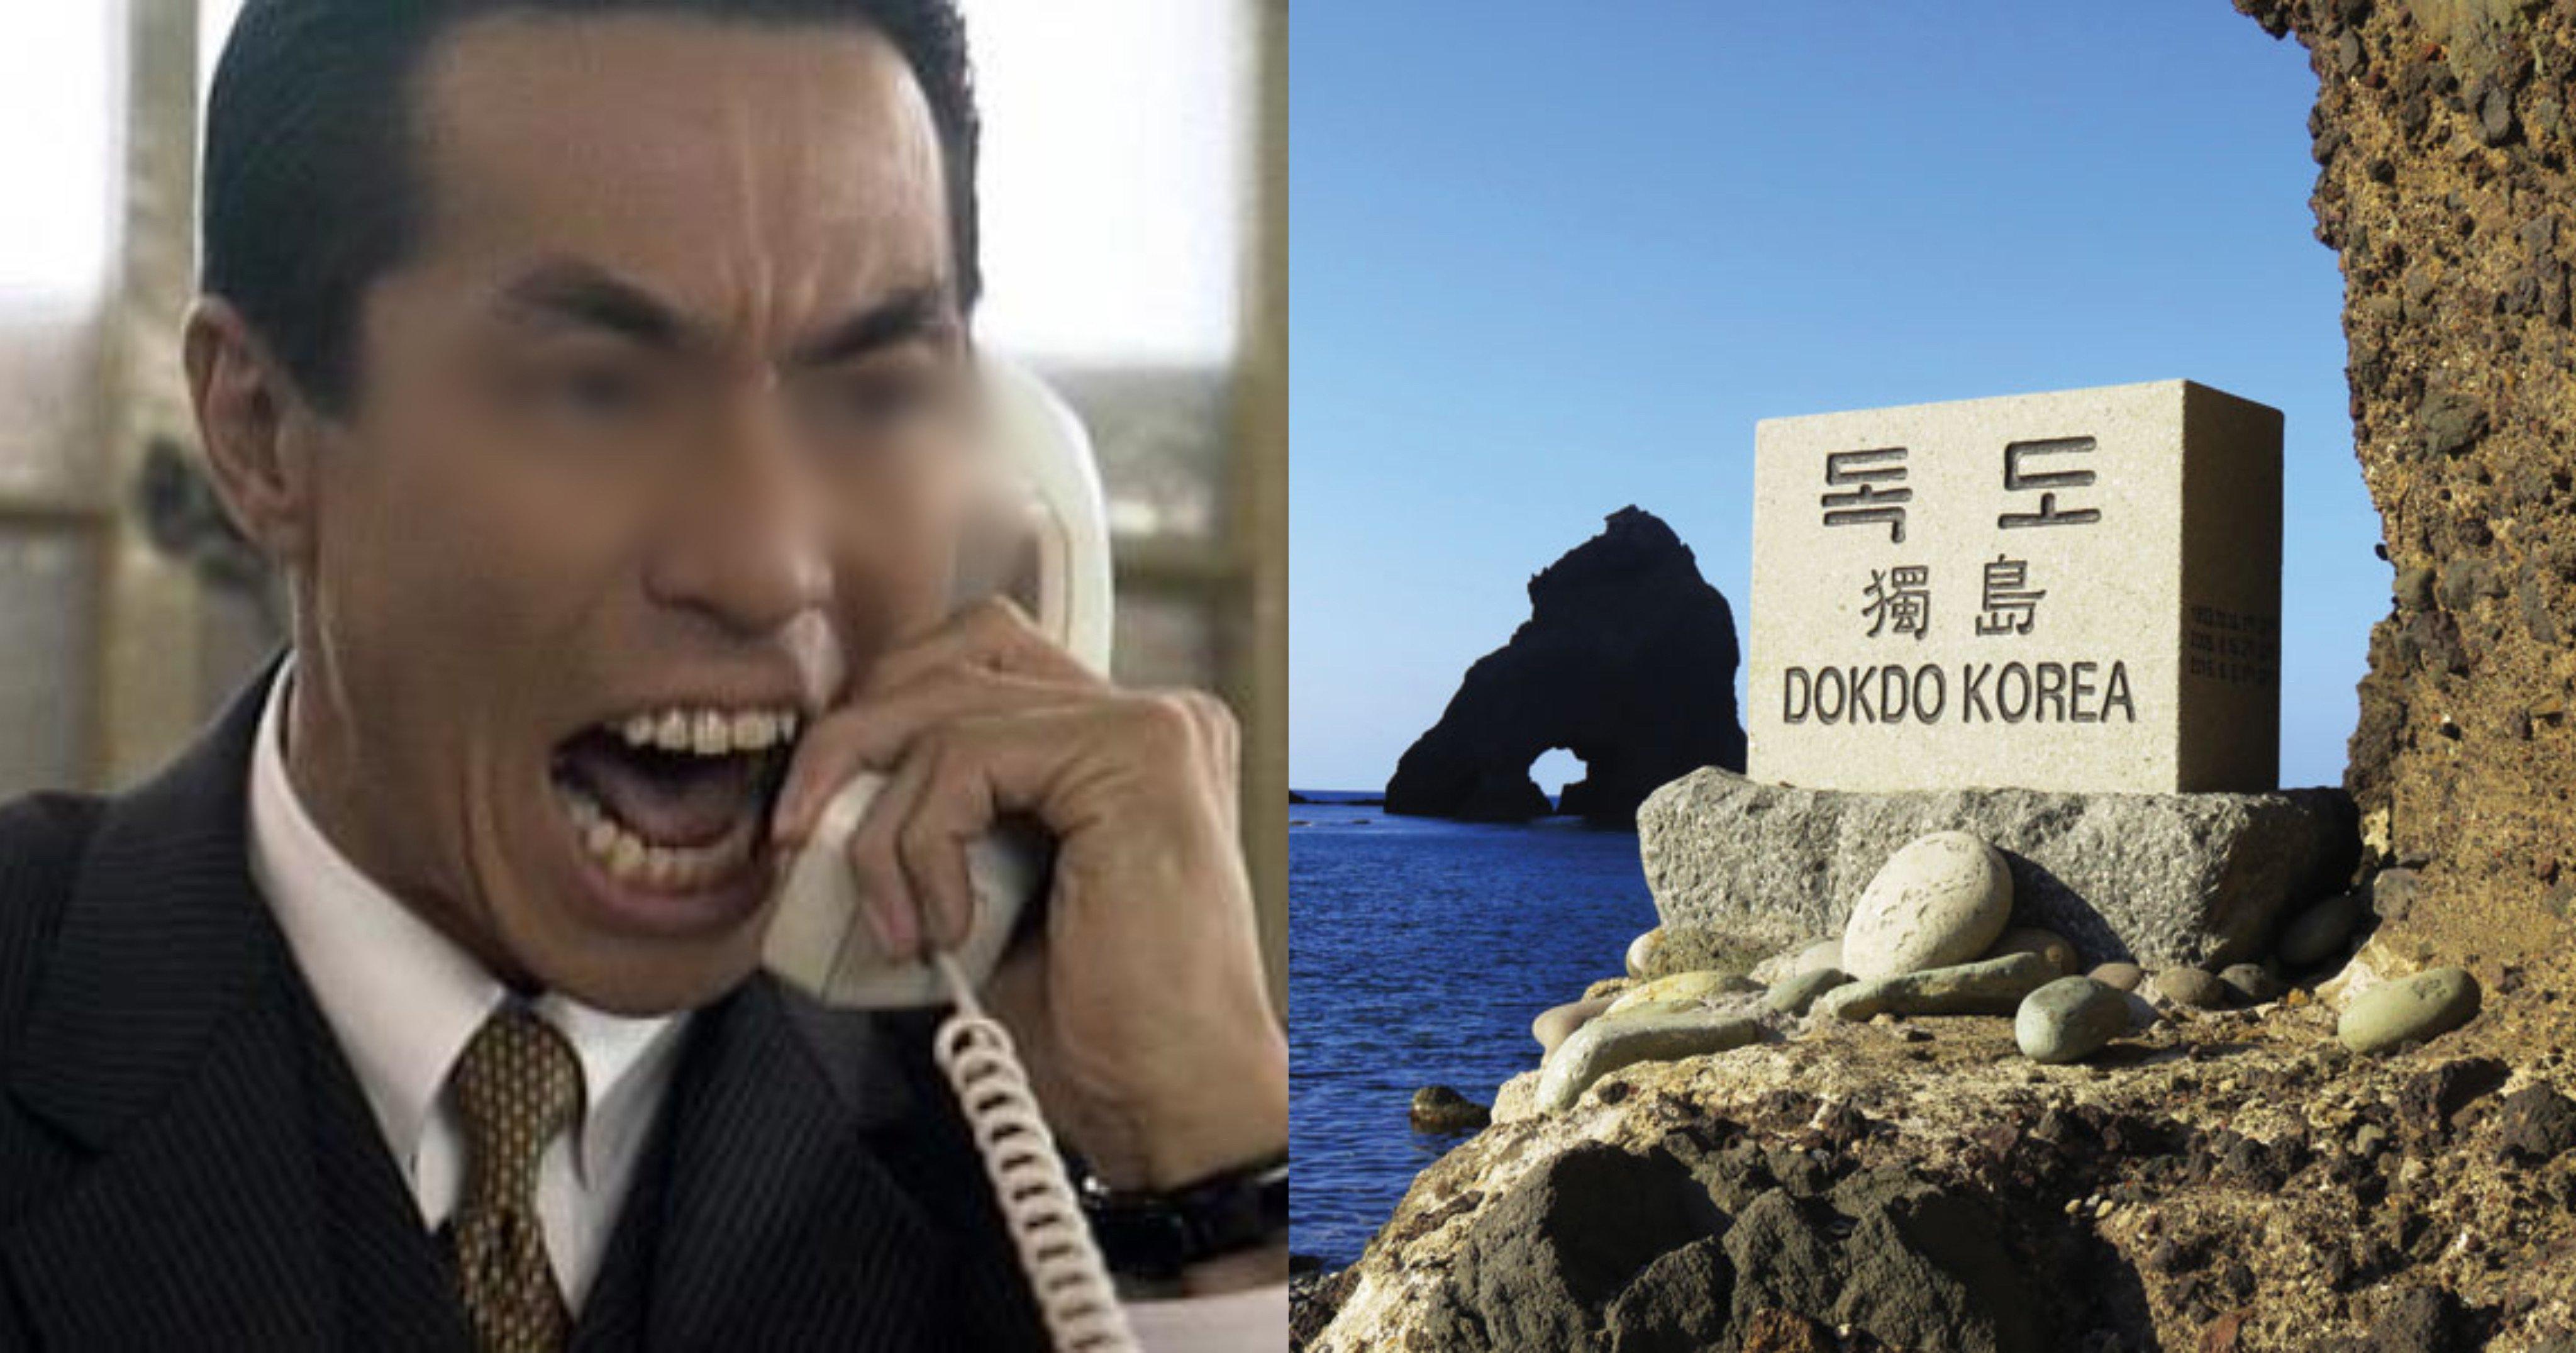 "kakaotalk 20210228 023403433.jpg?resize=1200,630 - ""독도는 일본 고유 영토!!!""라며 생떼 부리는 일본 매체의 주장(+사진)"